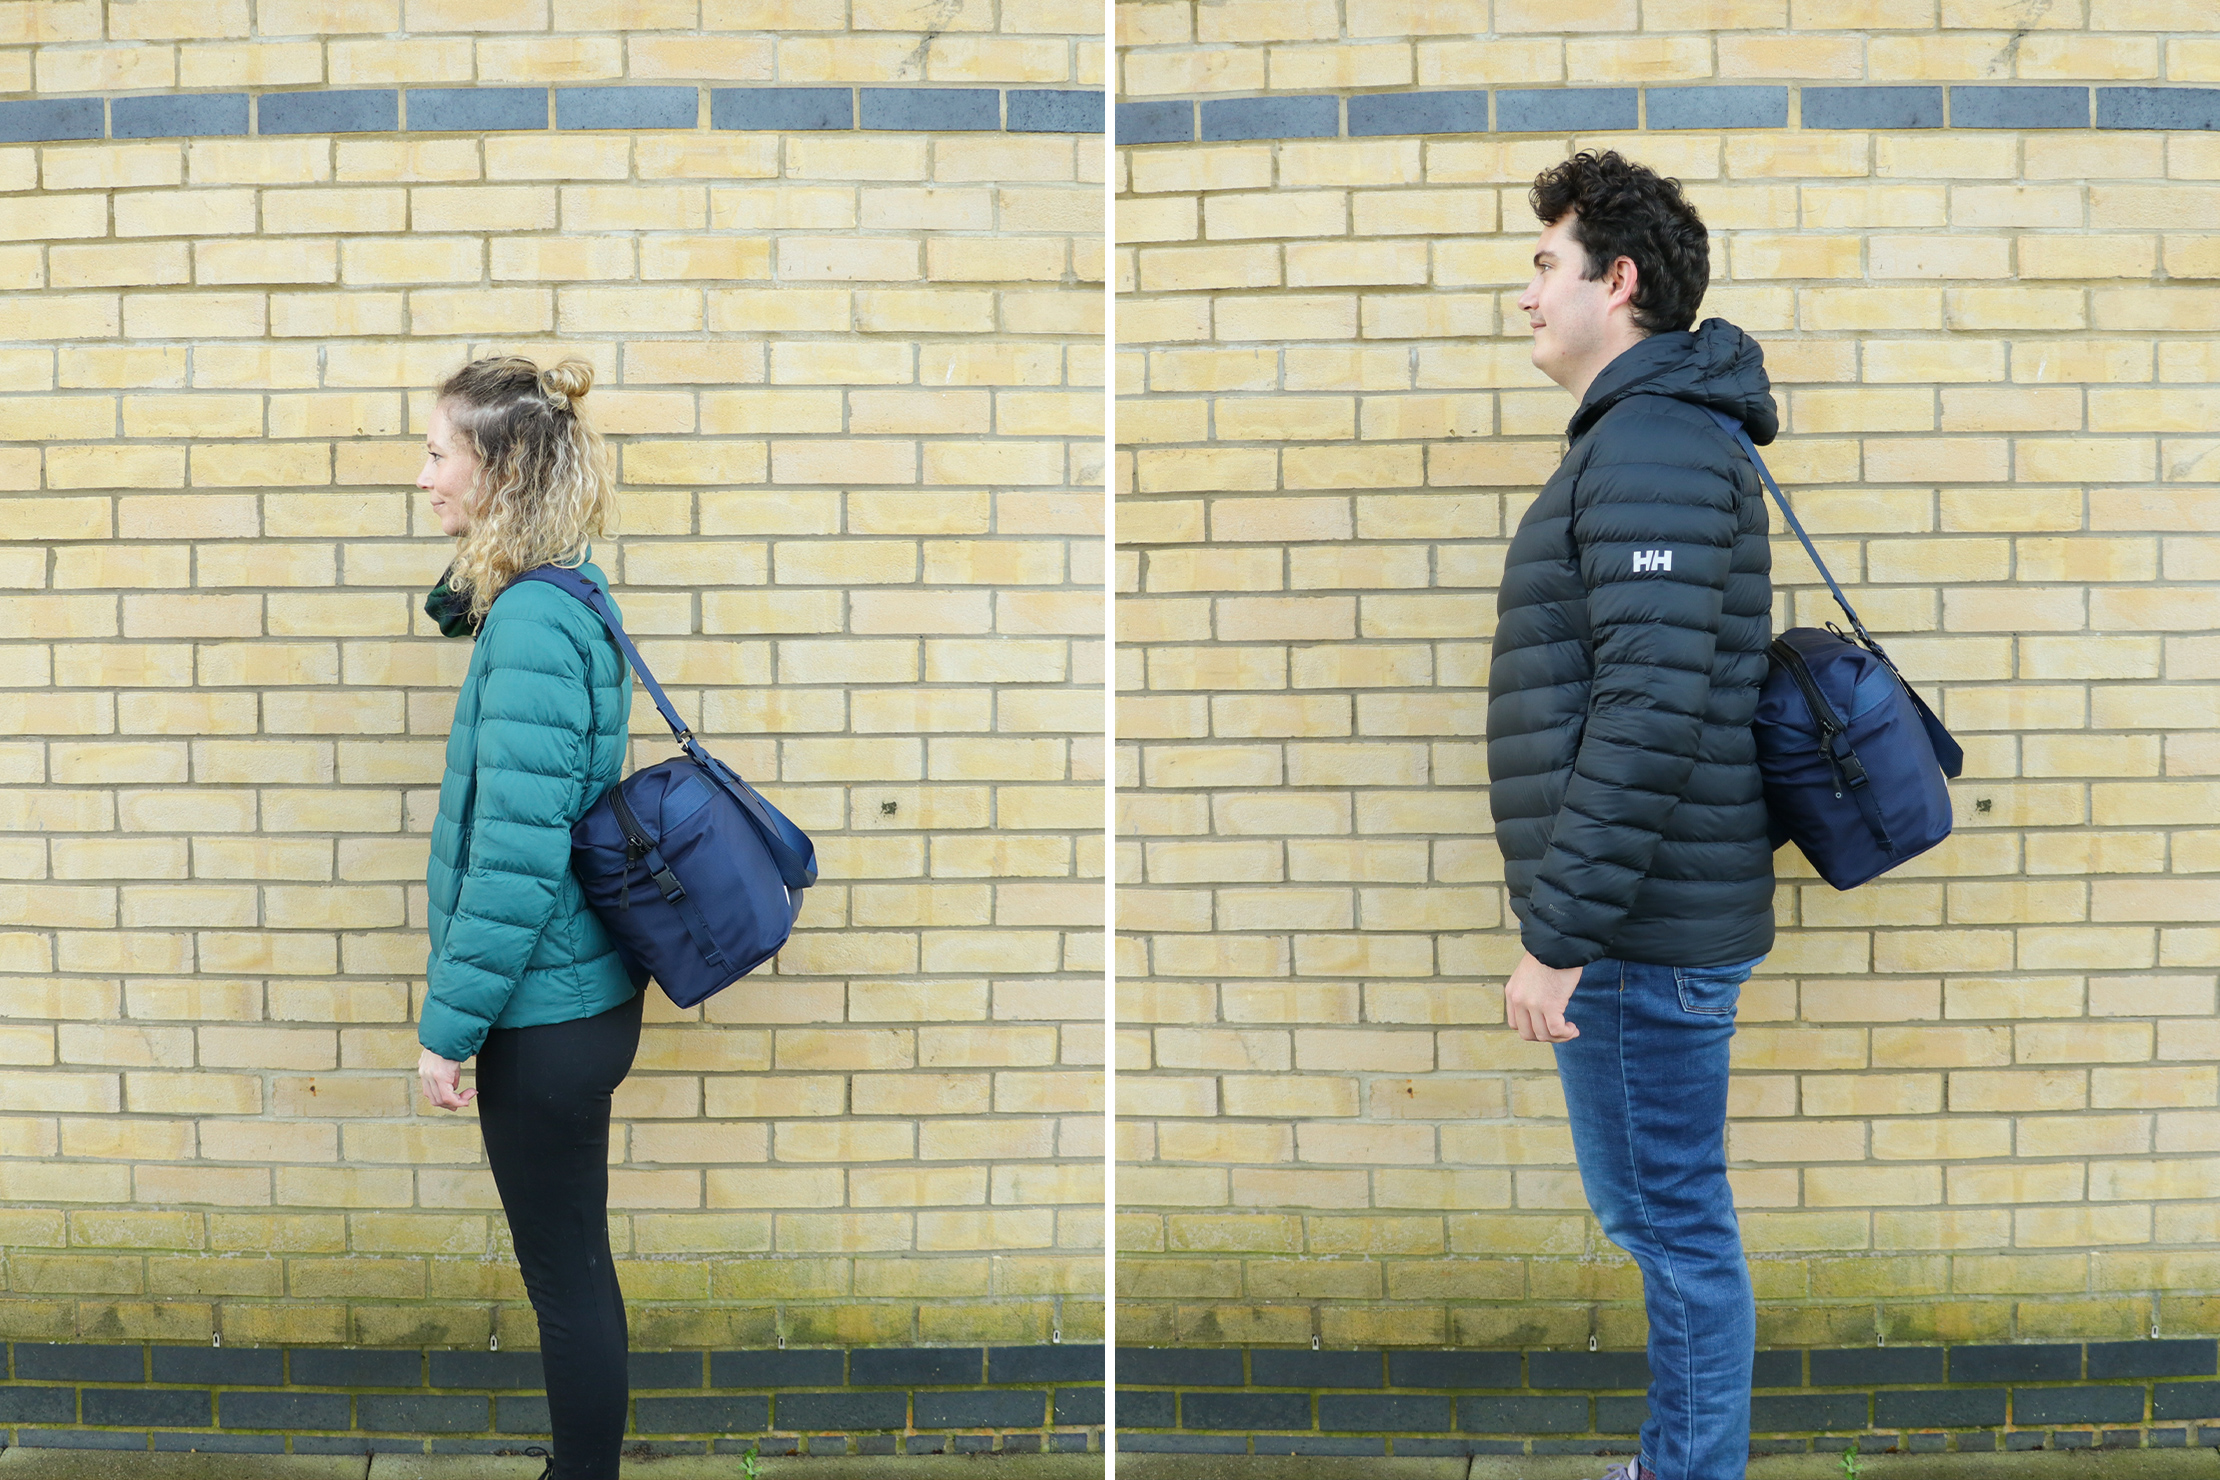 "Left: Rebecca Coates, Height, 5'7"" (170 cm), Torso: 16"" (41 cm)   Right: Nathan Coverdale, Height, 6'4"" (193 cm), Torso: 19"" (48 cm)"